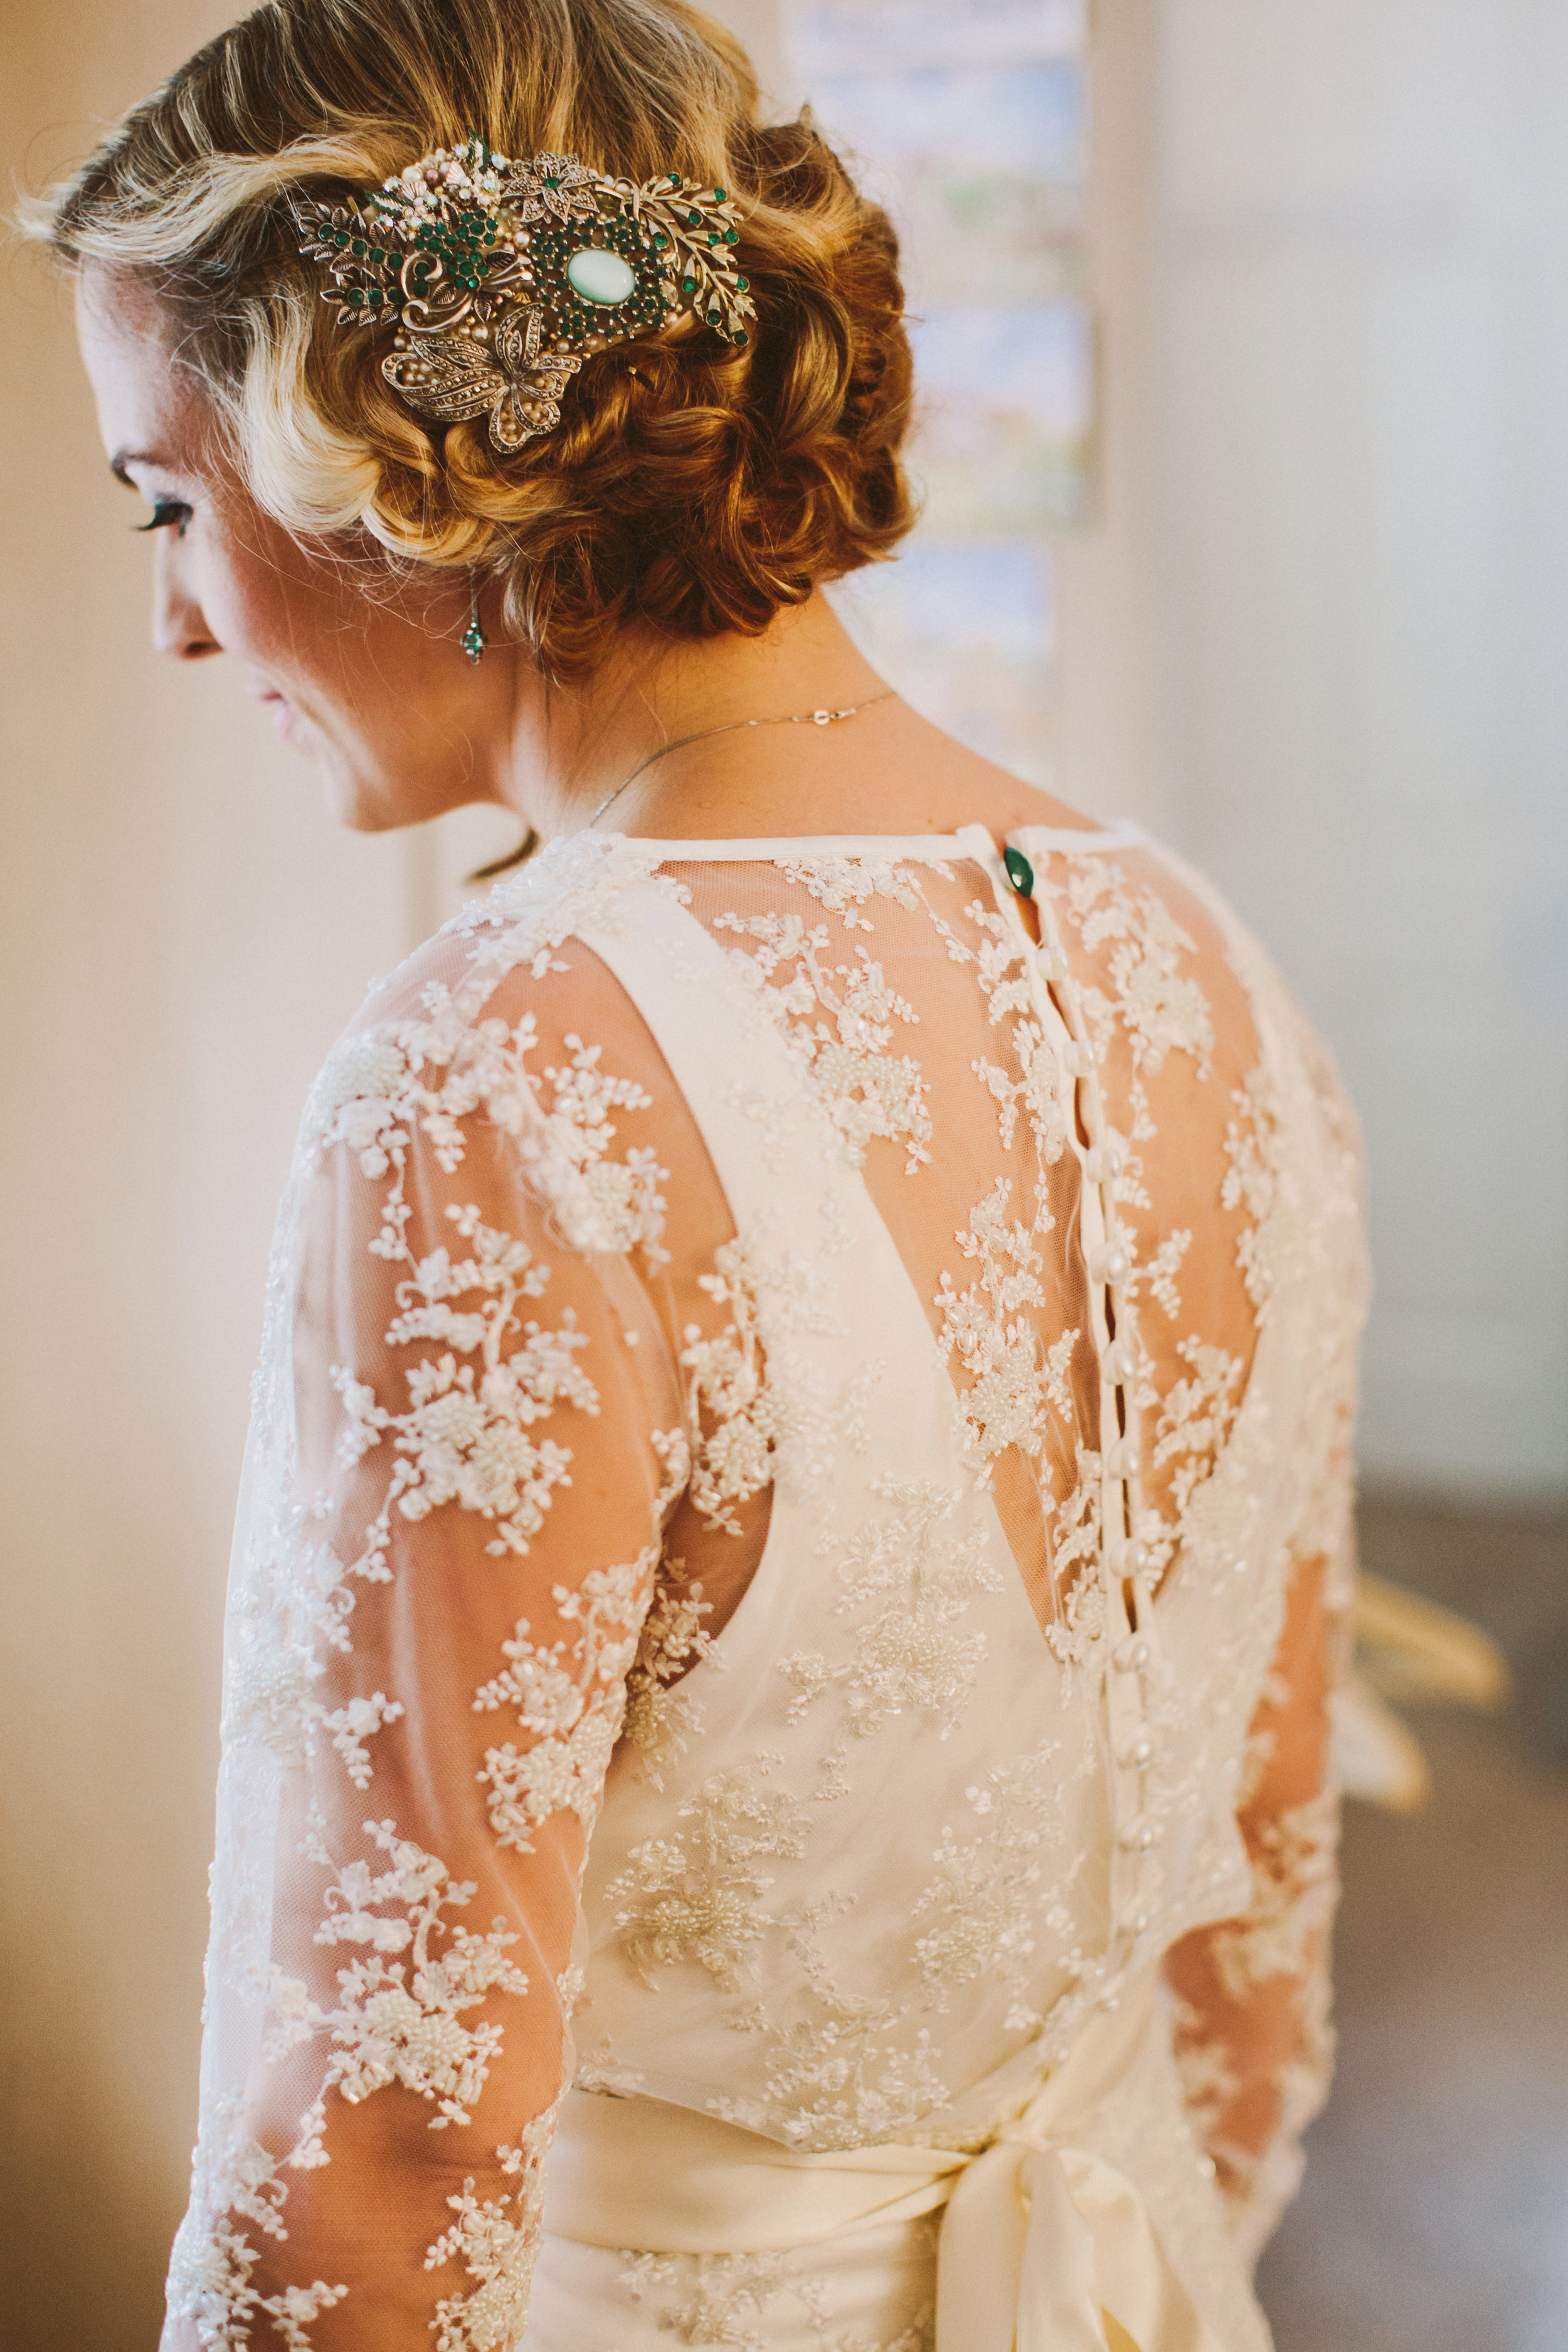 Jo-Peak-District-Autumn-Wedding-Bespoke-Vintage-Bias-Wedding-Gown-Lace-Jacket-Susanna-Greening-Matlock-10